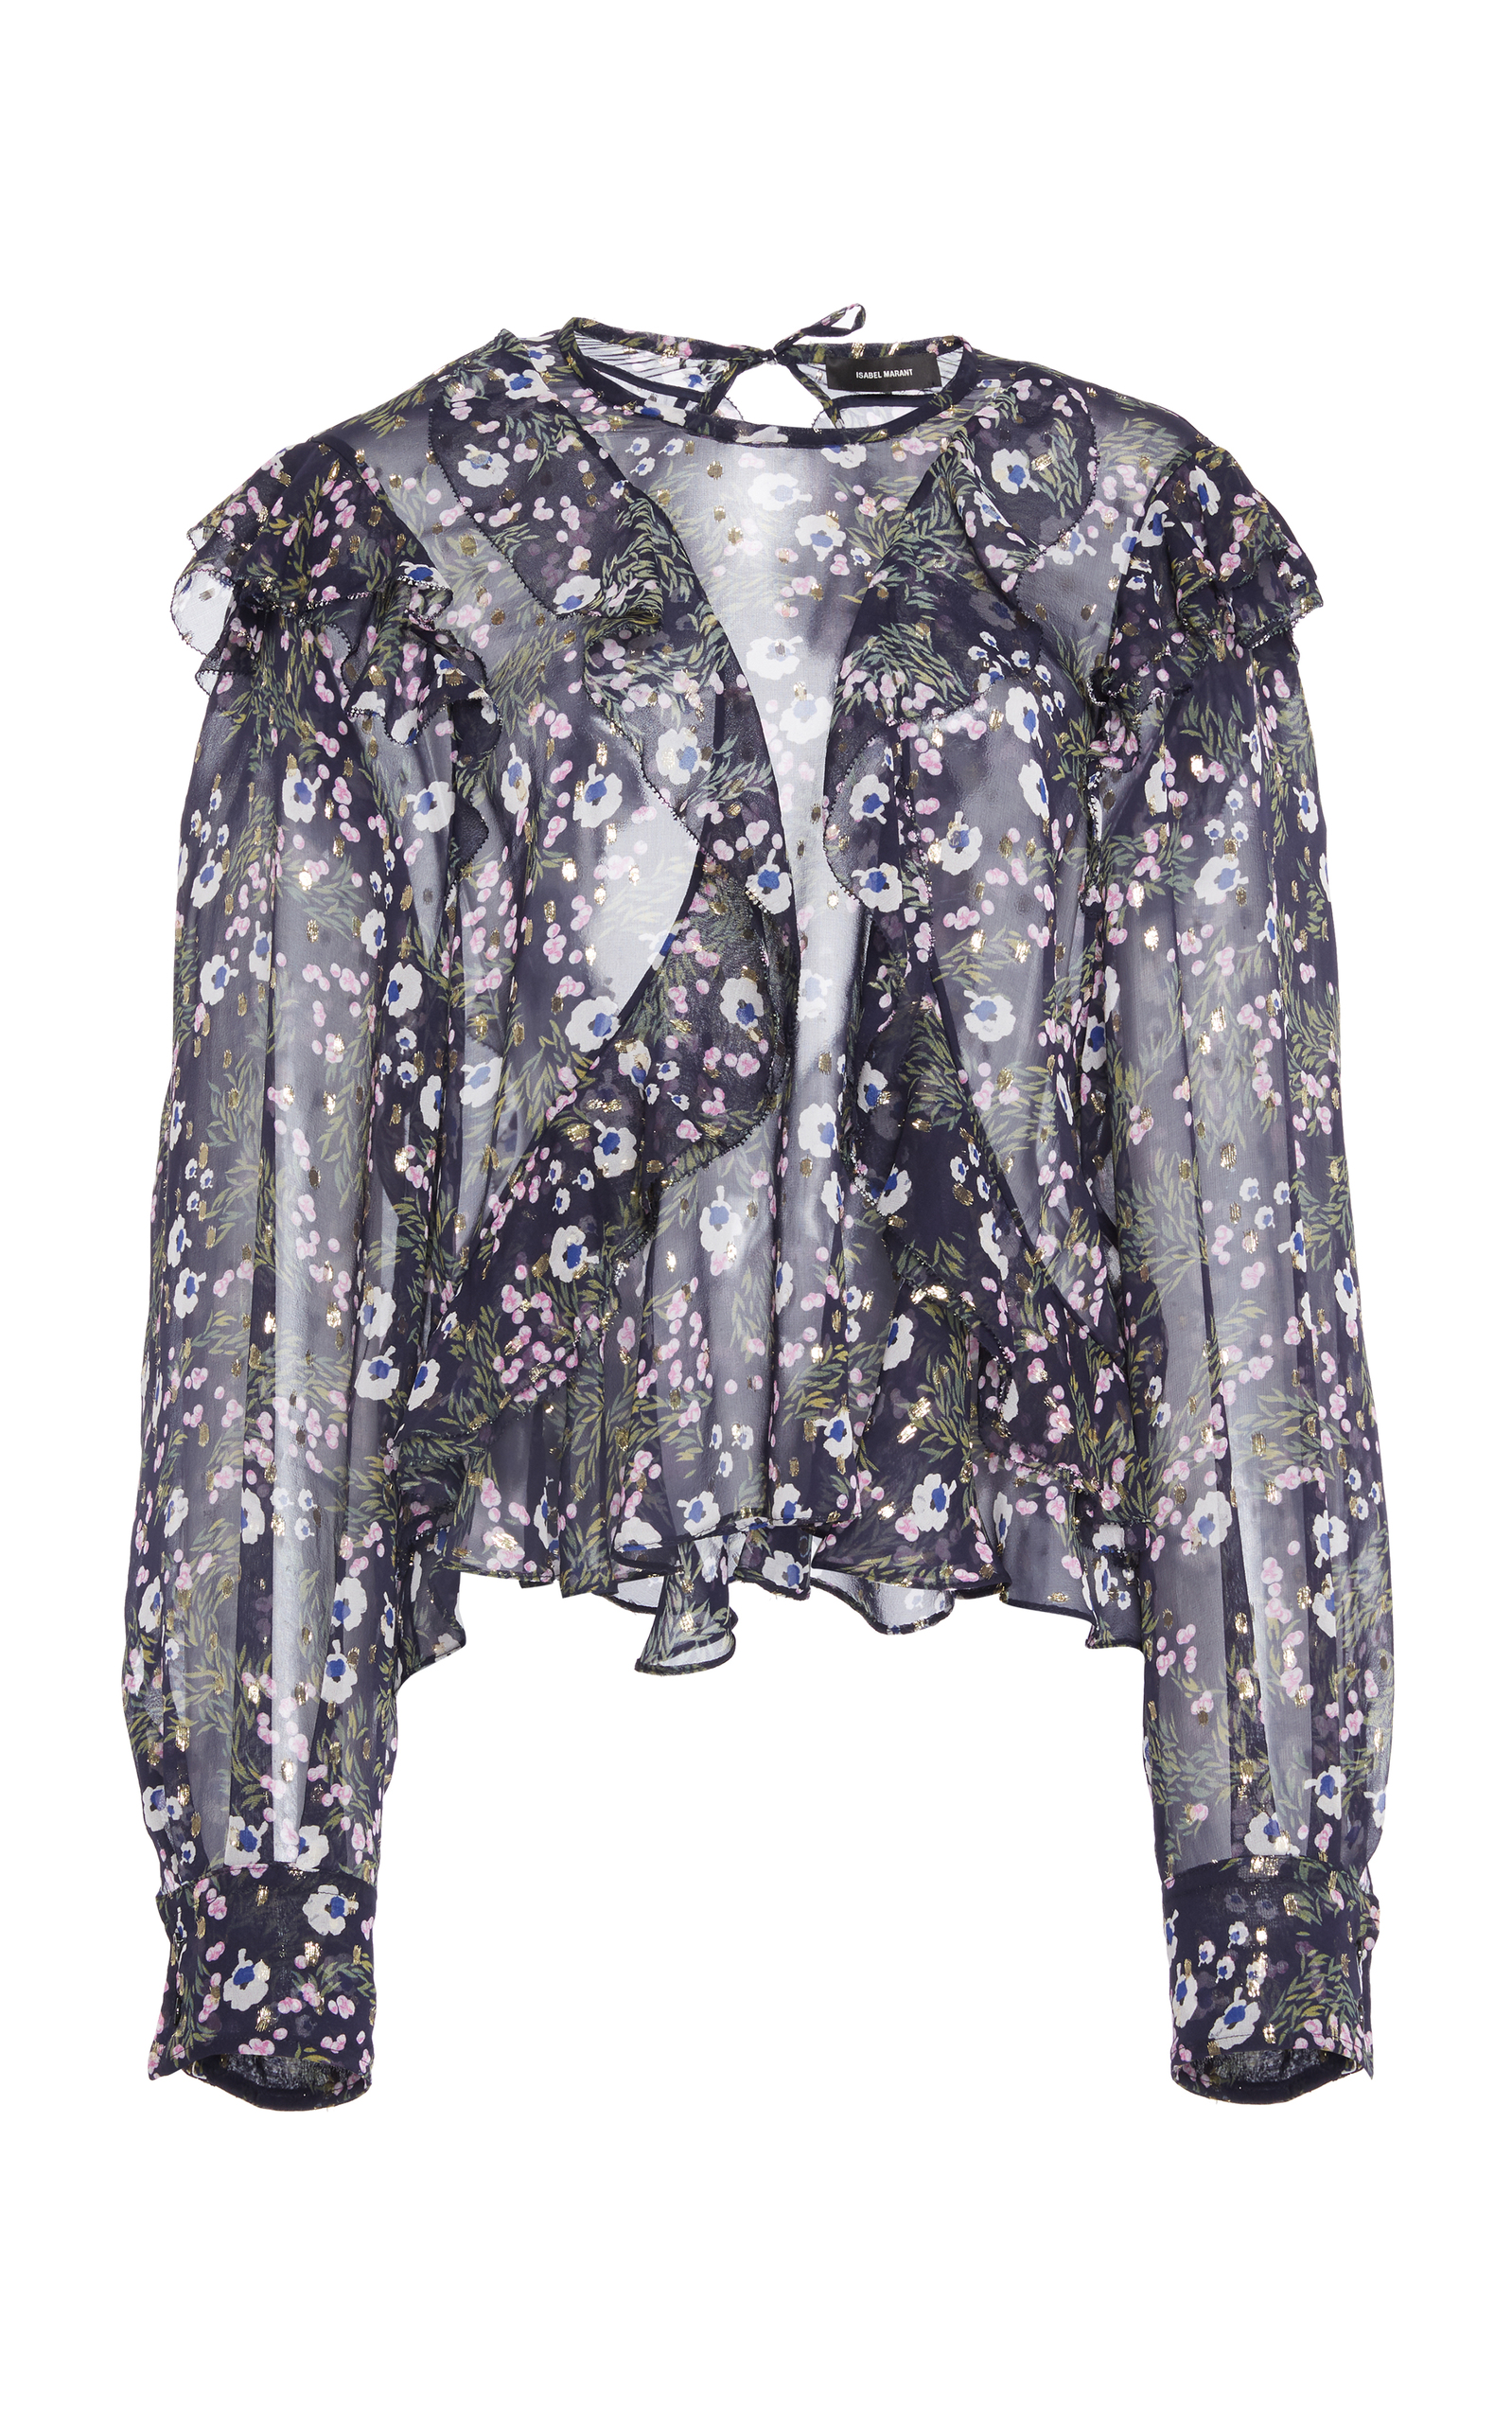 5134246488928 large_isabel-marant-floral-muster-metallic-silk-top.jpg